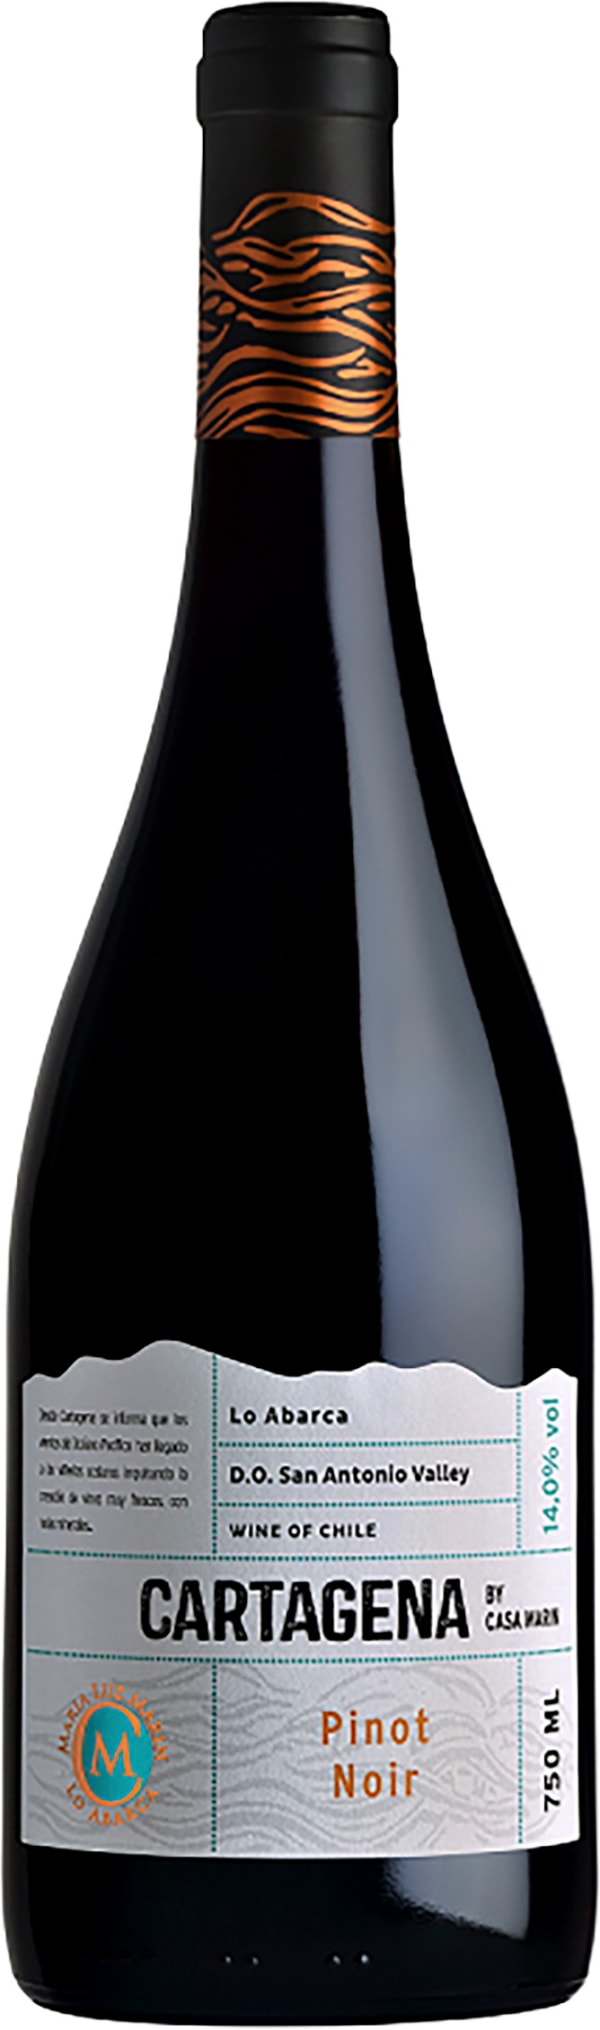 Casa Marin Cartagena Pinot Noir 2016